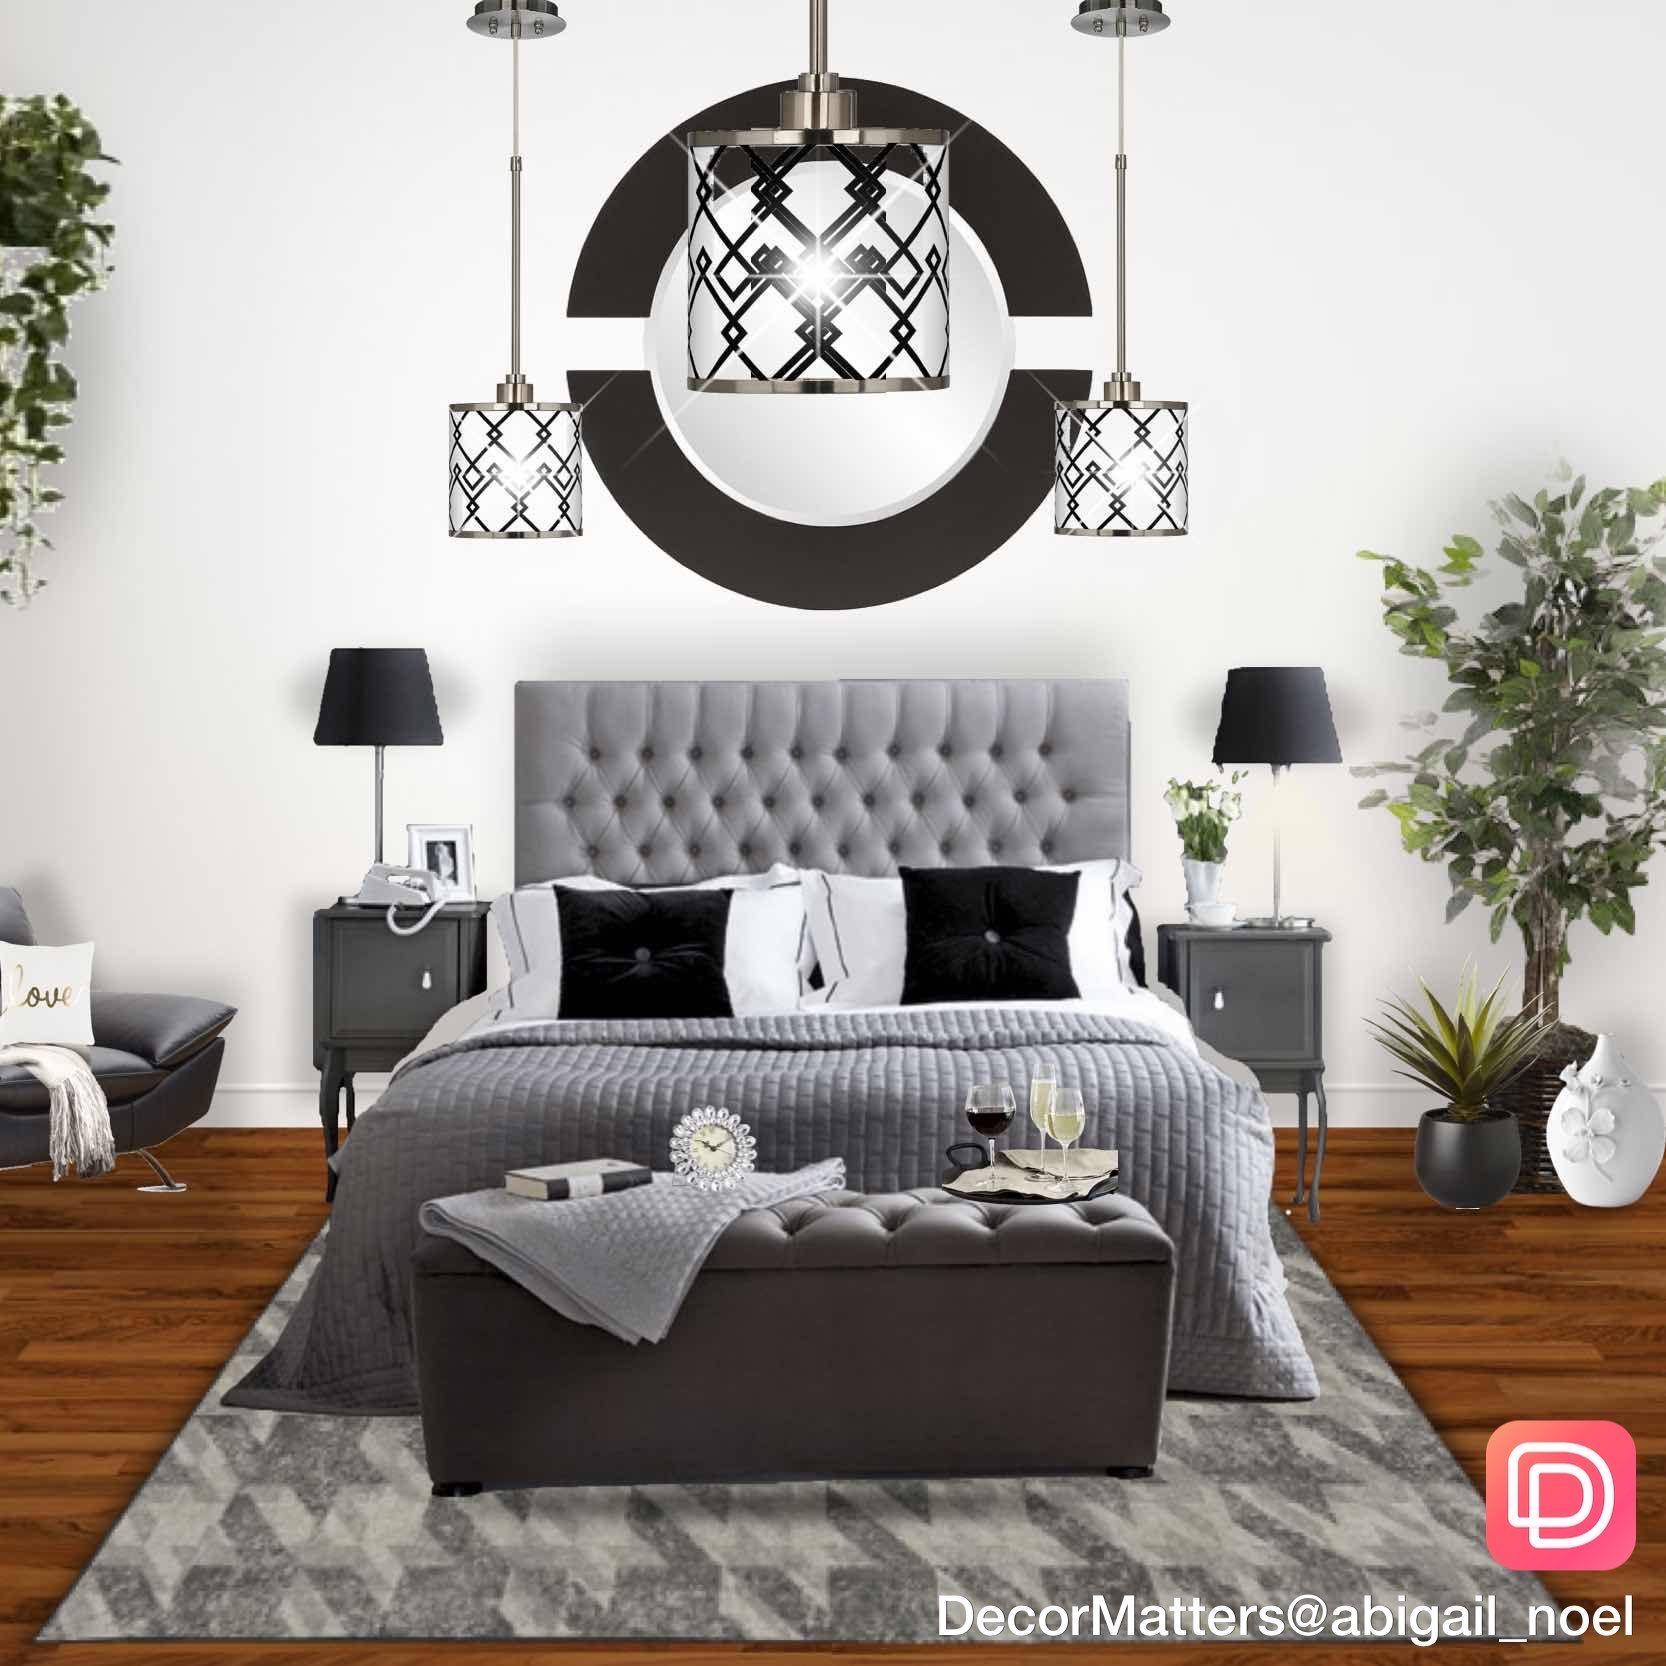 Beautiful Monochromatic Design Bedroom By Our User Abigail Noel